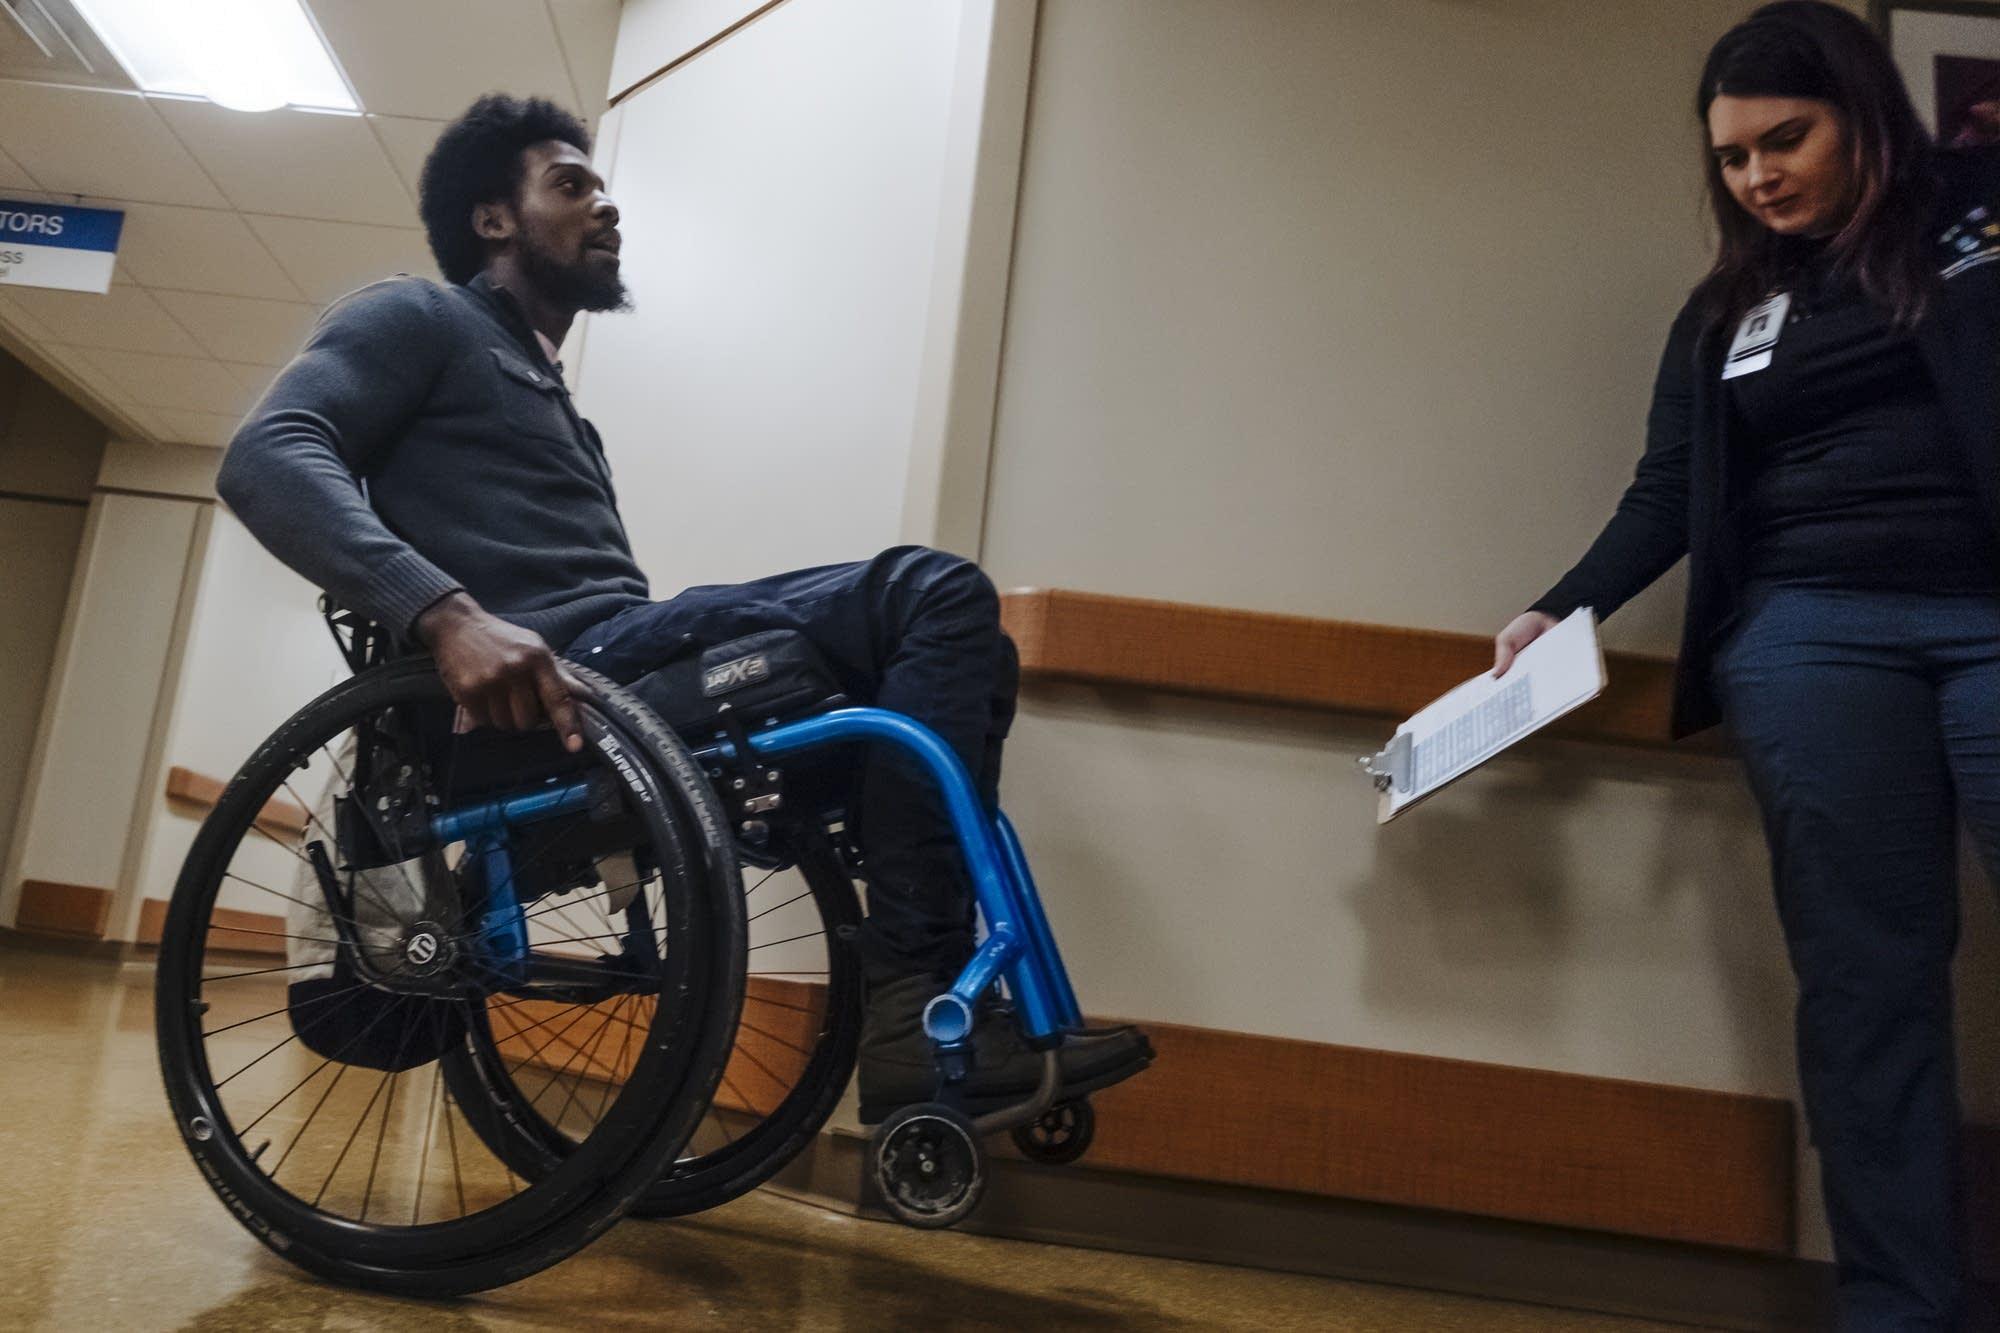 D'Andre Alexander wheelies in his wheelchair.